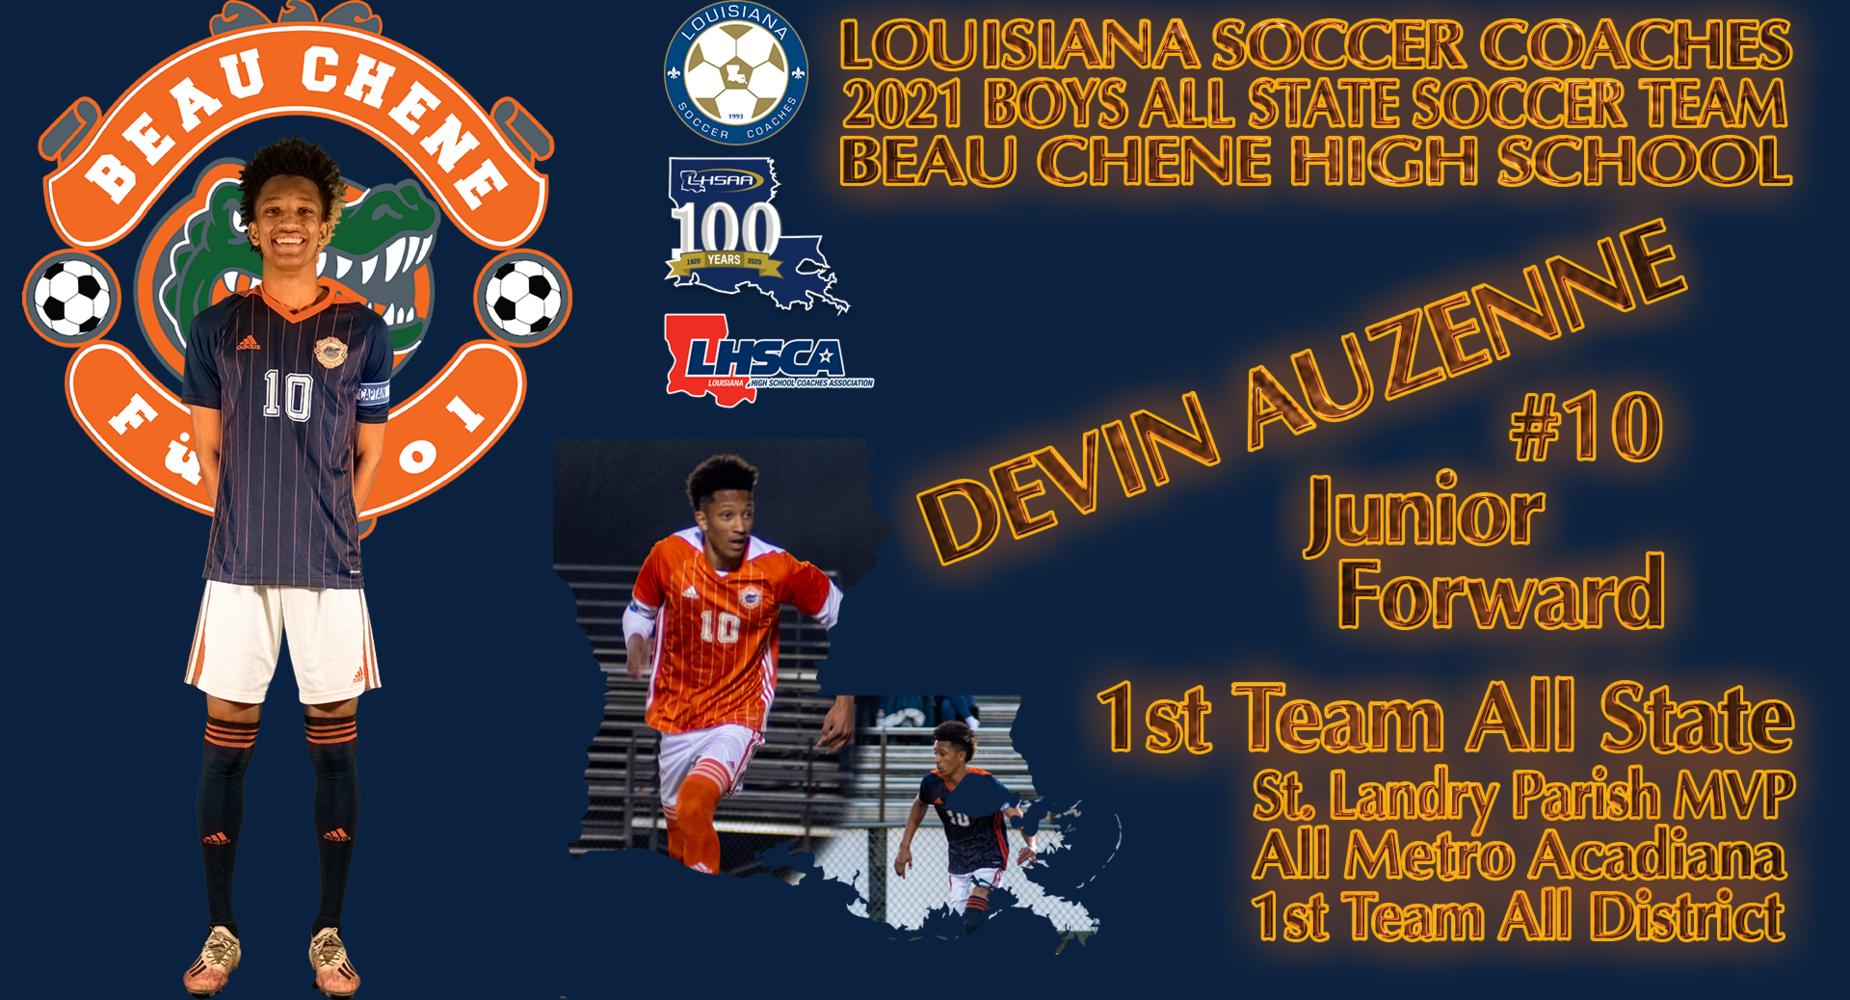 LHSSA - Devin Auzenne - Boys All State Soccer Team